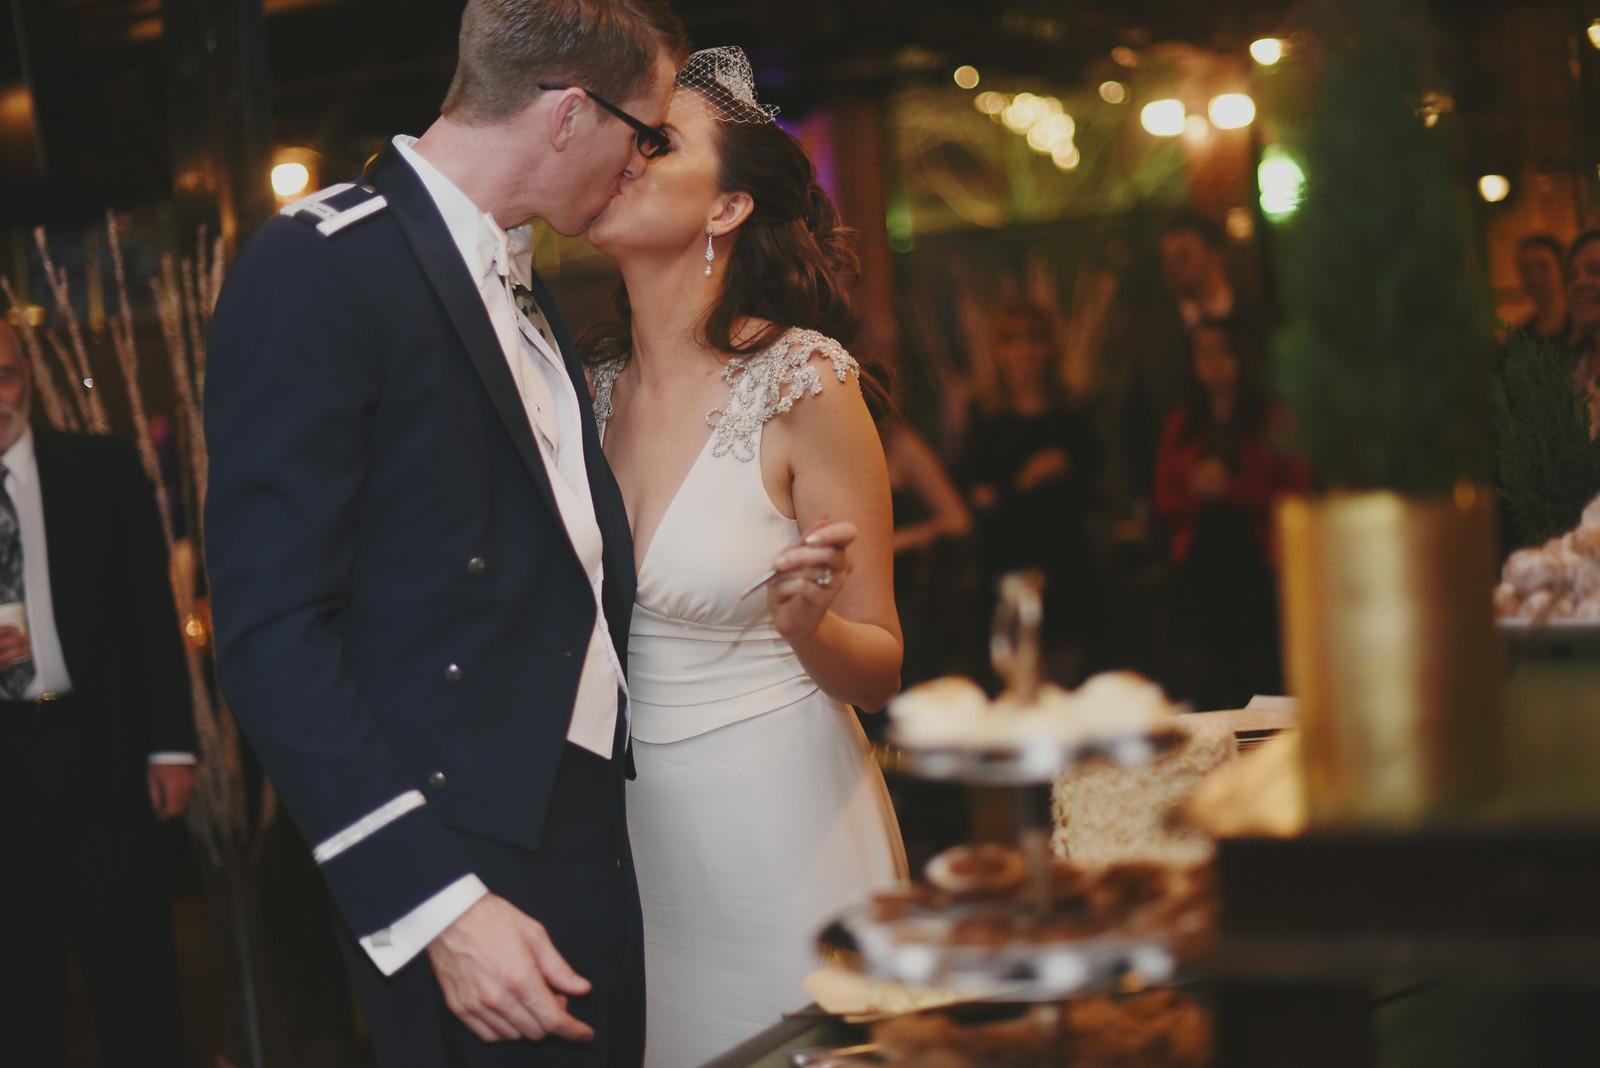 holiday-wedding-planners-colorado.jpg